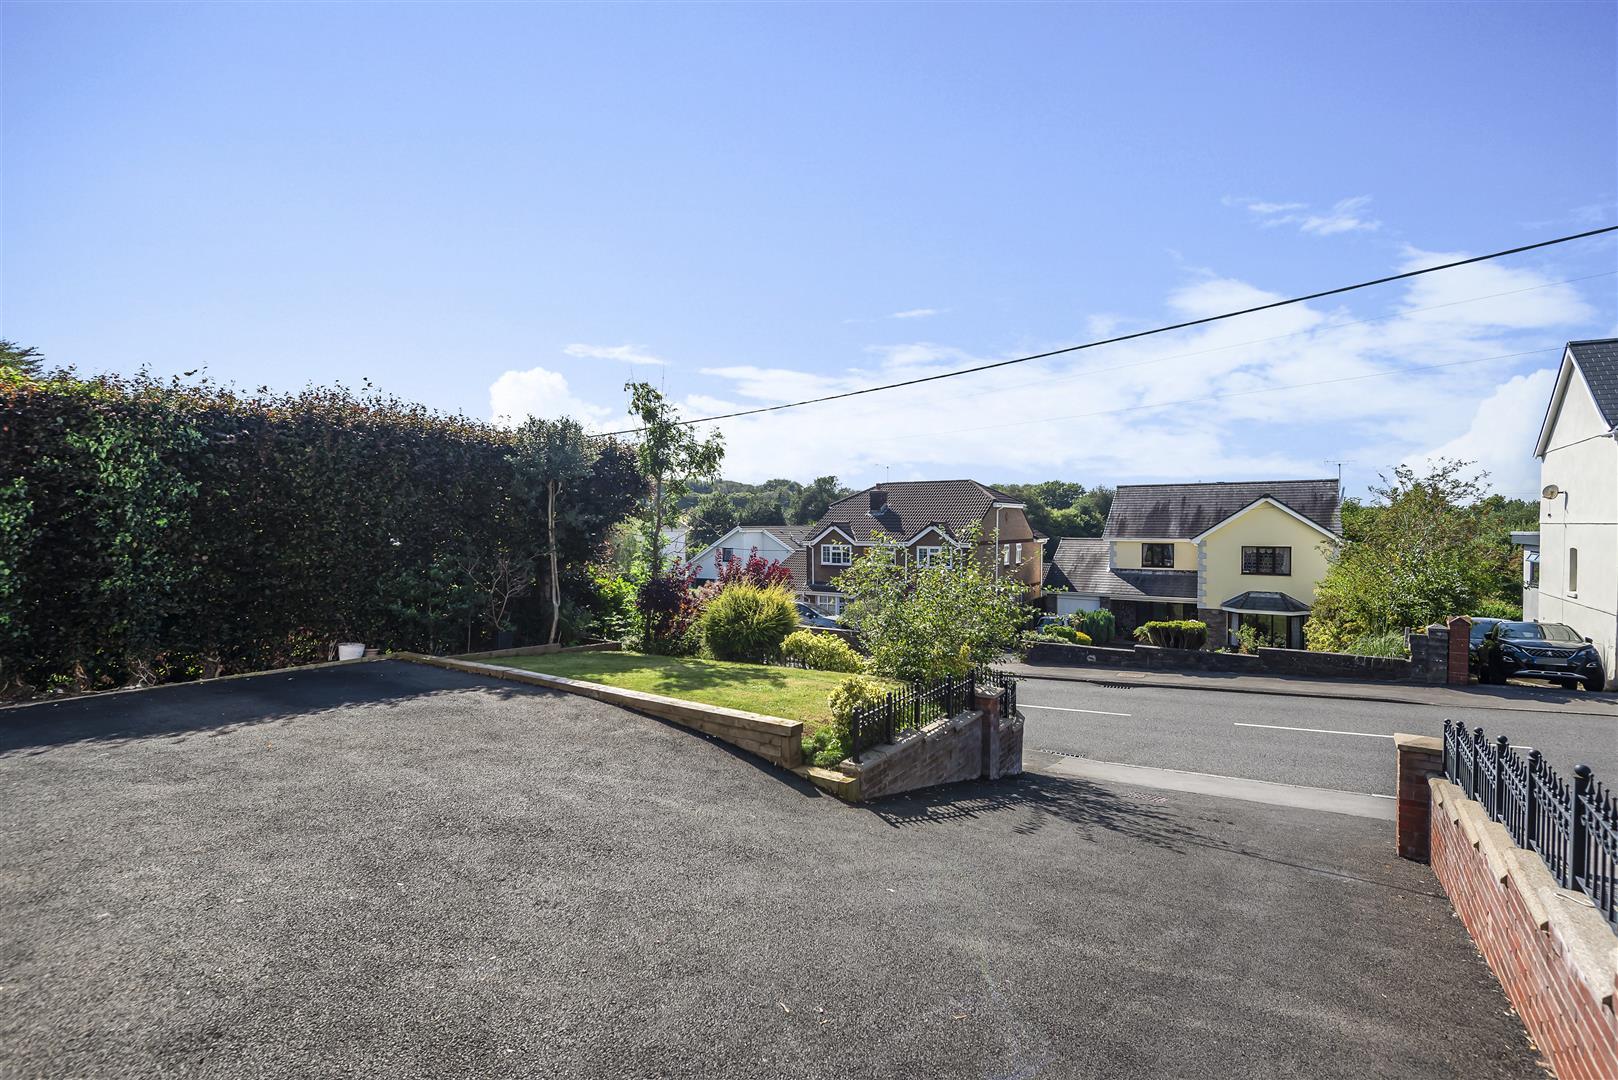 Swansea Road, Llangyfelach, Swansea, SA5 7JA